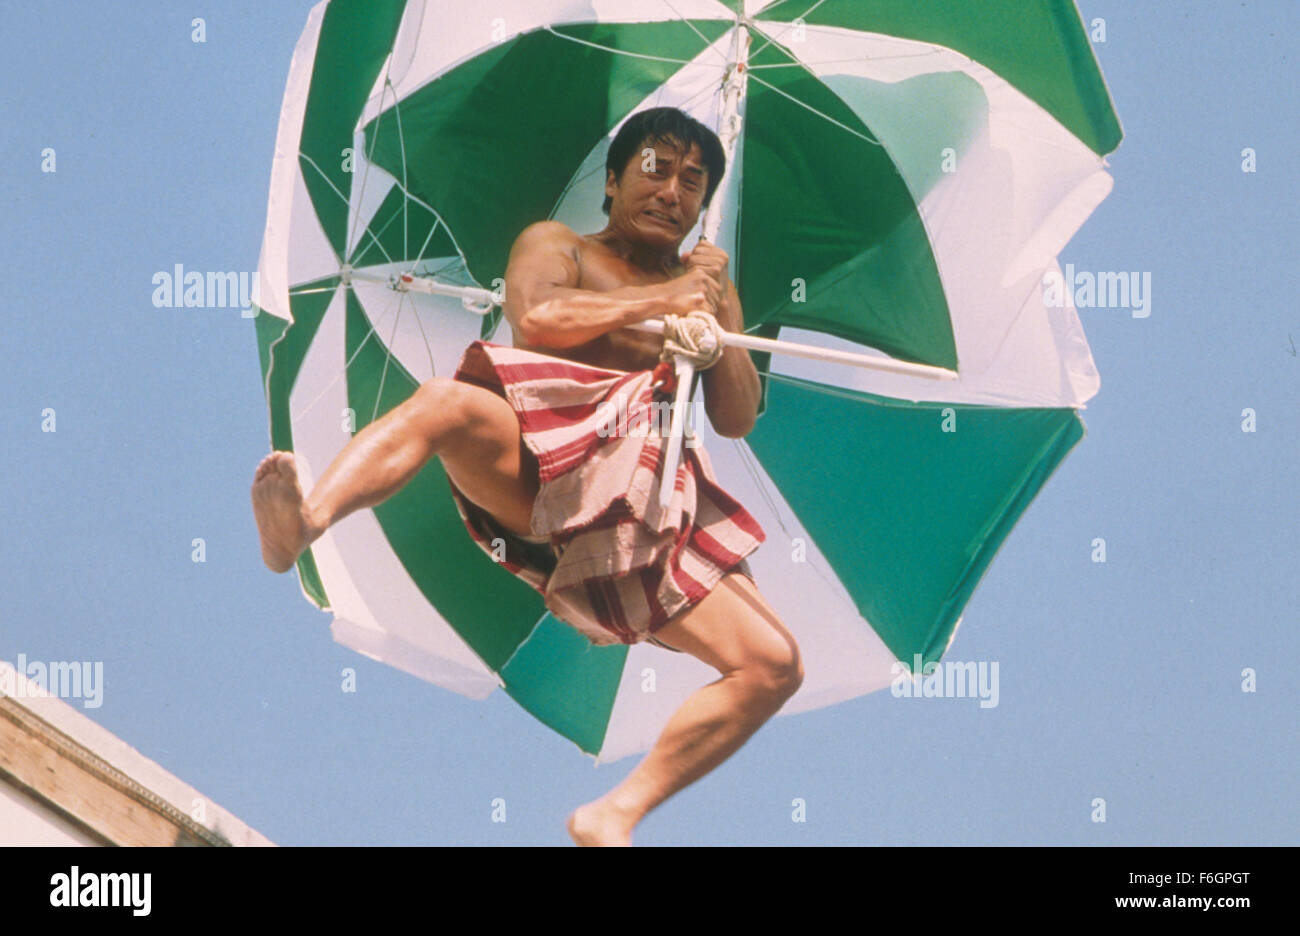 Jan 18, 2001; Hong Kong, China; Actor/stuntman JACKIE CHAN stars as Buck Yuen in the Miramax Films action/comedy Stock Photo